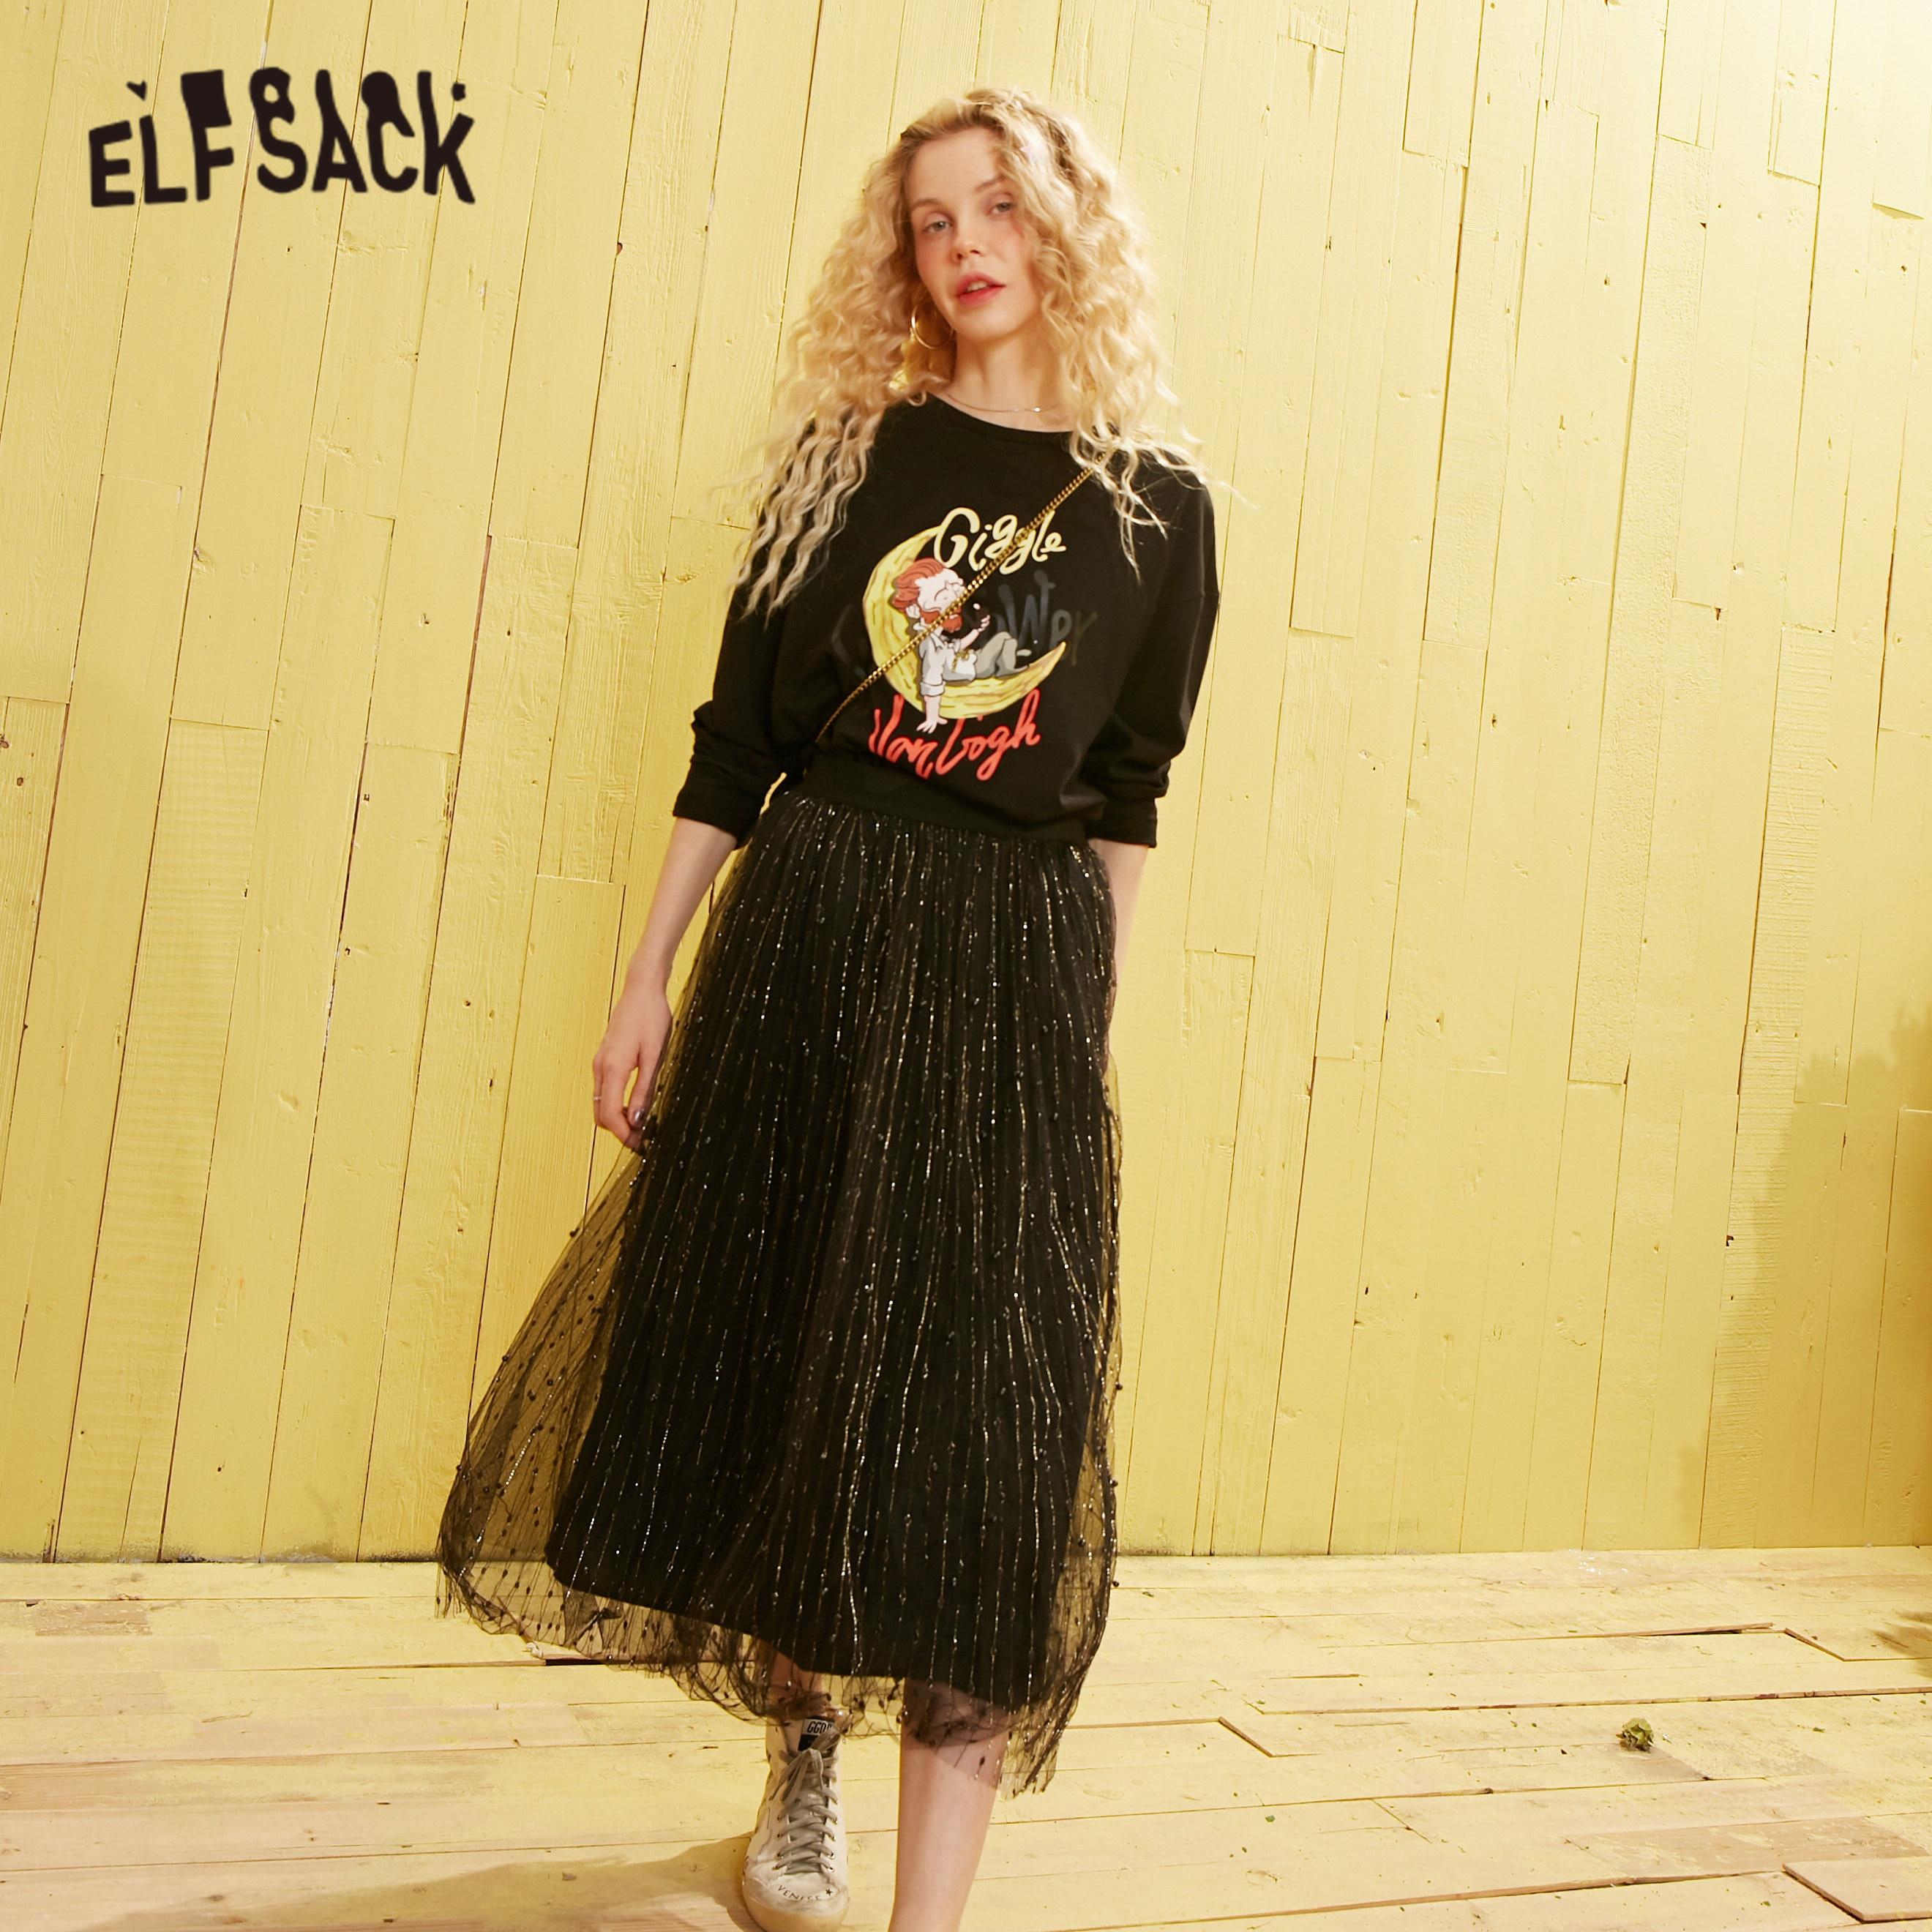 ELFSACK Black Polka Dot Mesh Elastic Waist Tiered Layer Skirt Women 2020 Spring Golden Silk Embroidery Korean Ladies Daily Skirt